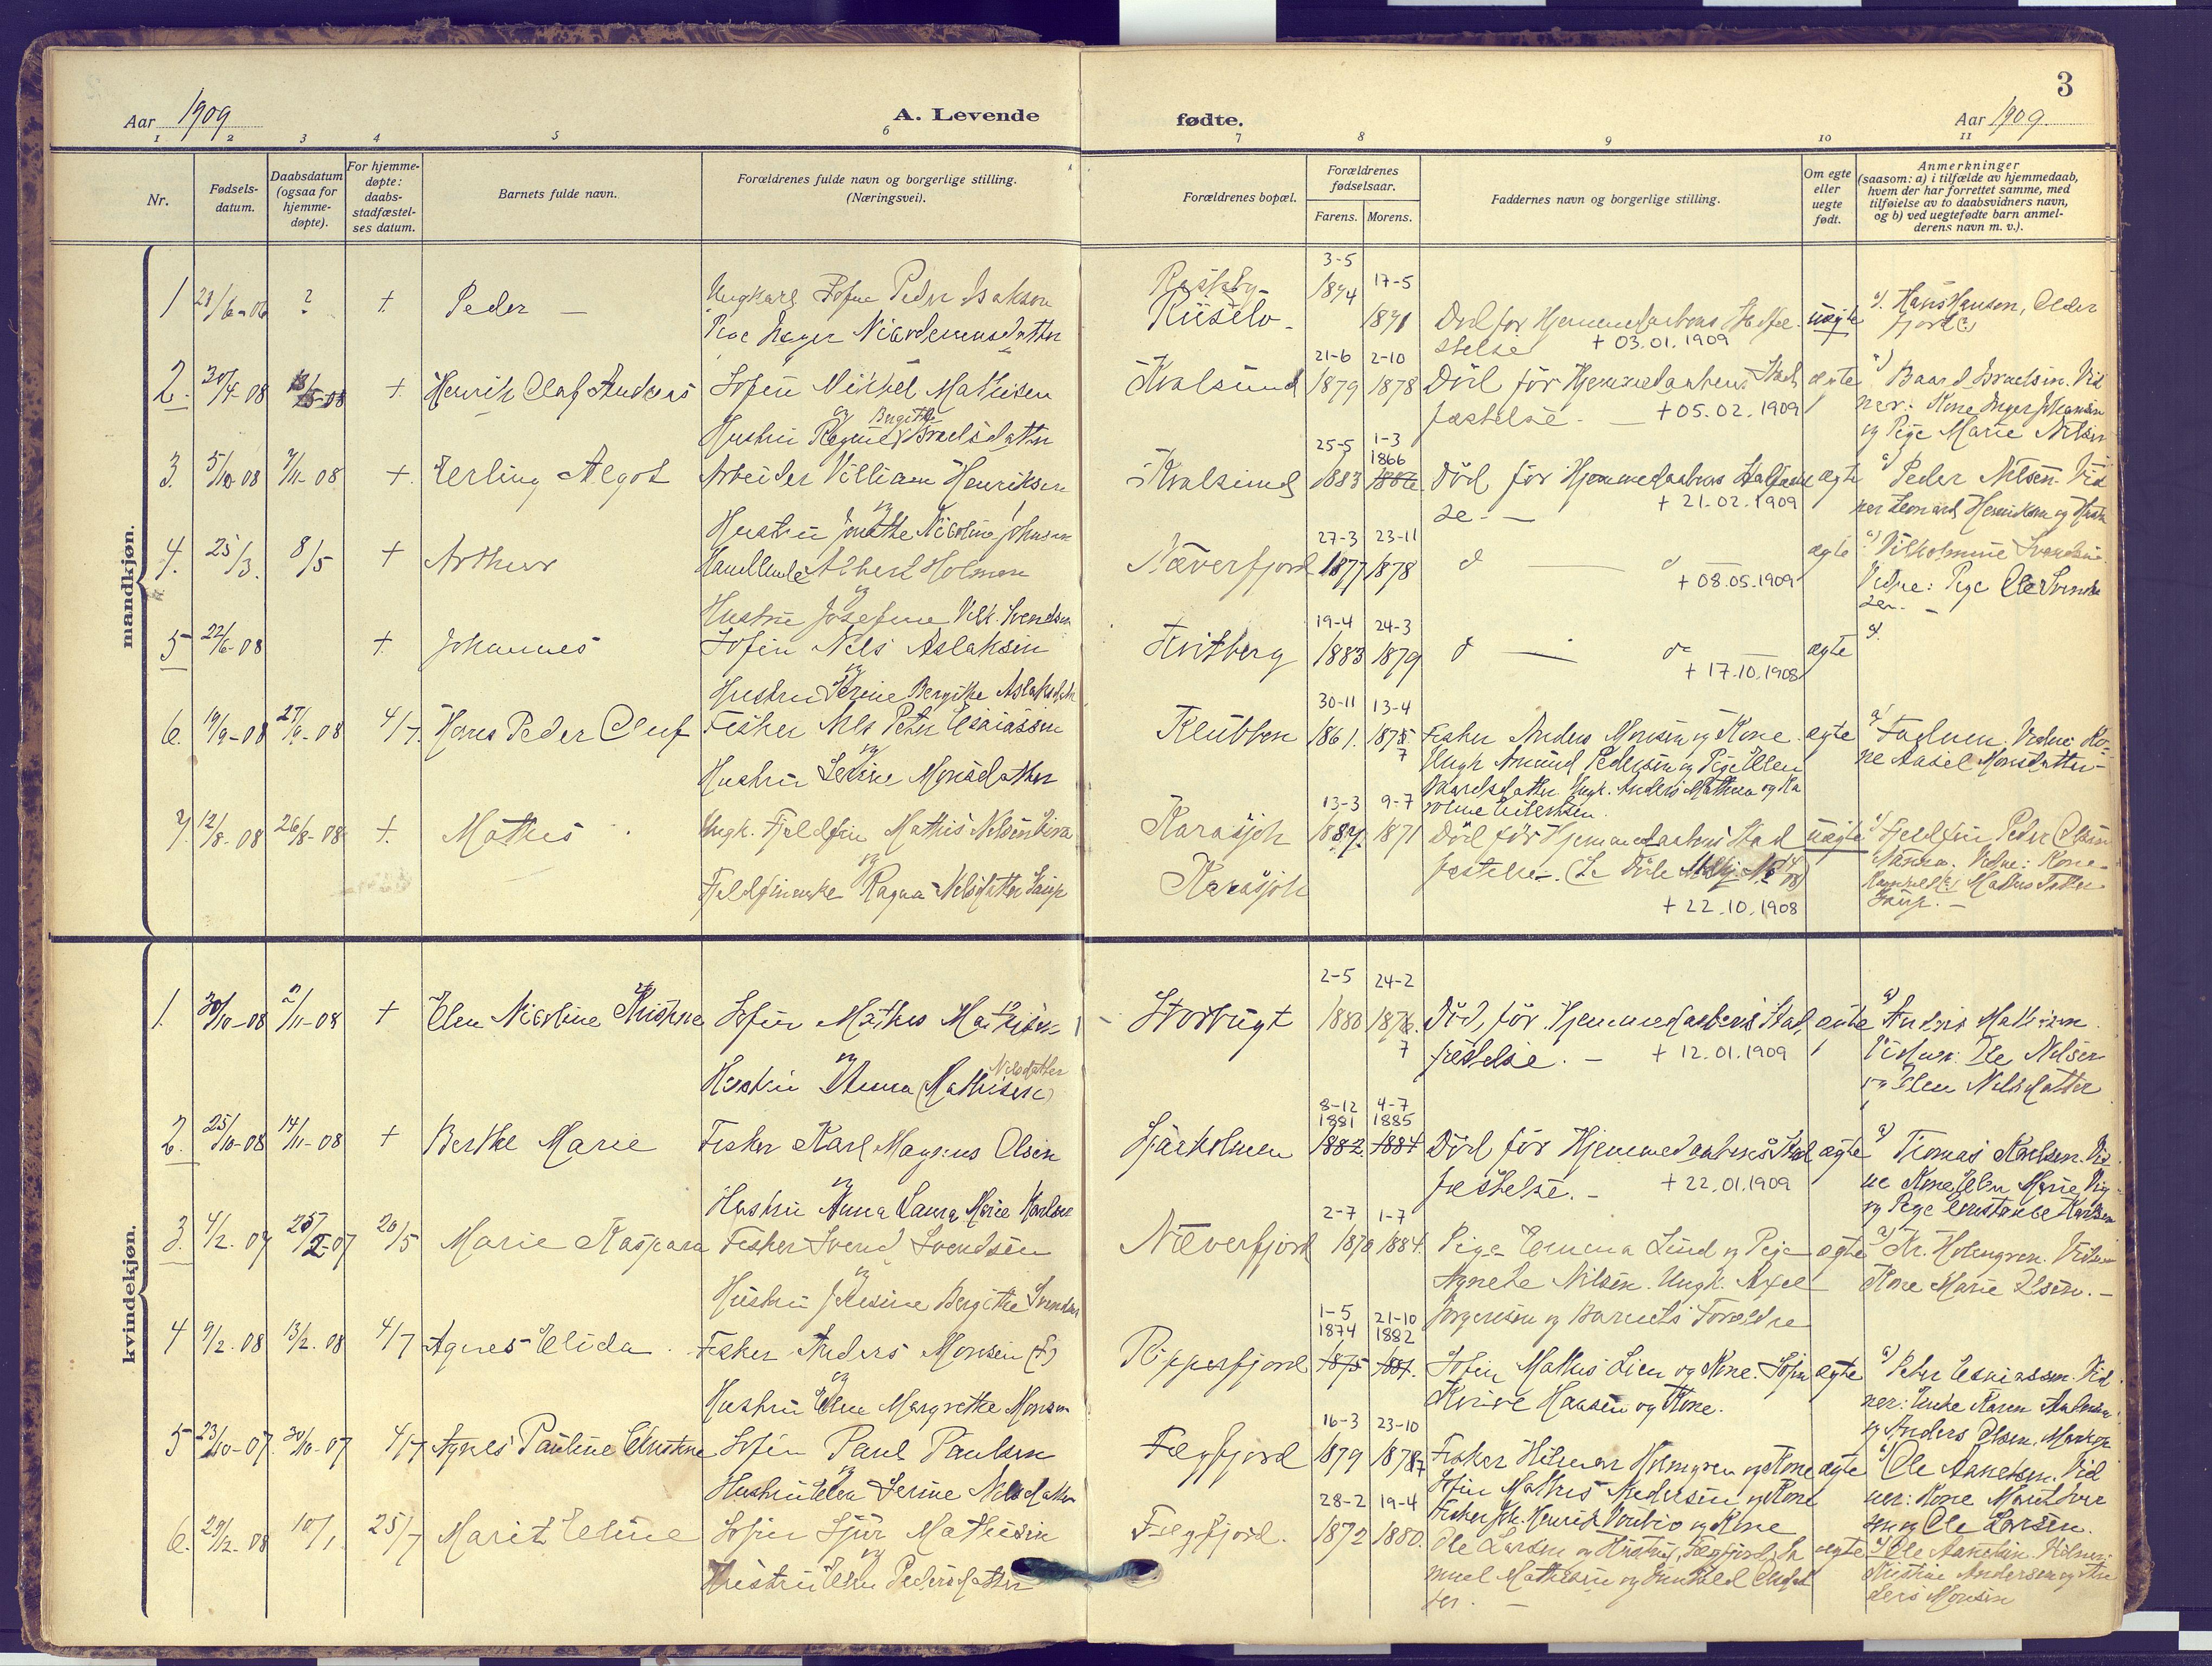 SATØ, Hammerfest sokneprestembete, Ministerialbok nr. 16, 1908-1923, s. 3